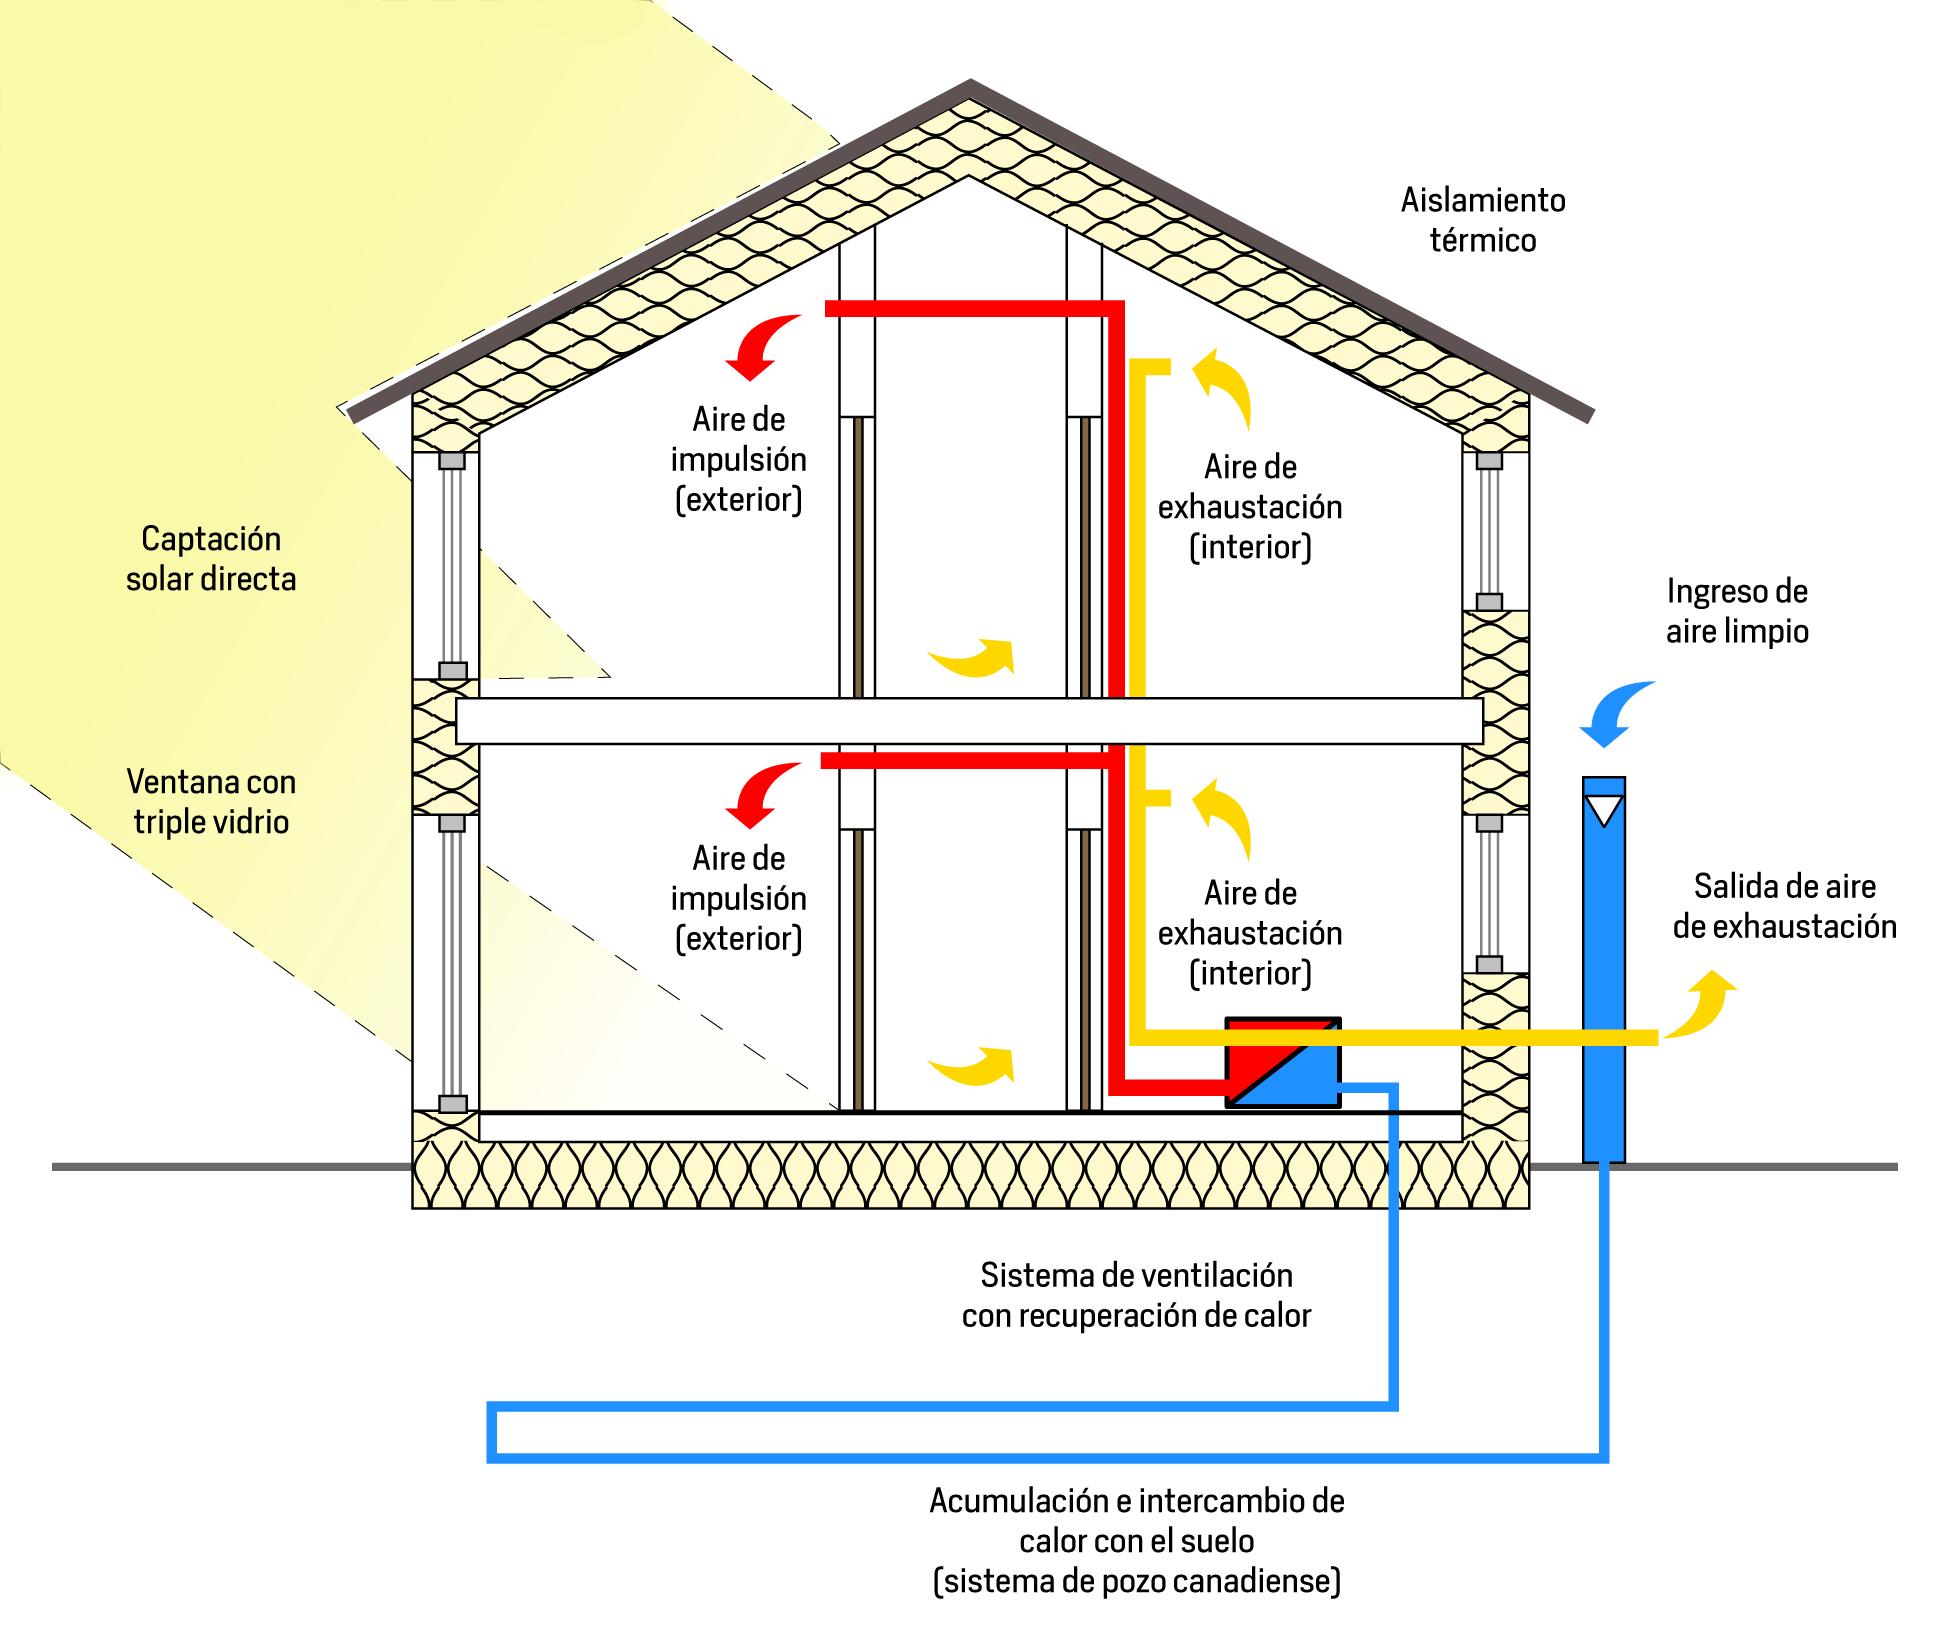 Recuperación de aire en sistemas Passivhaus